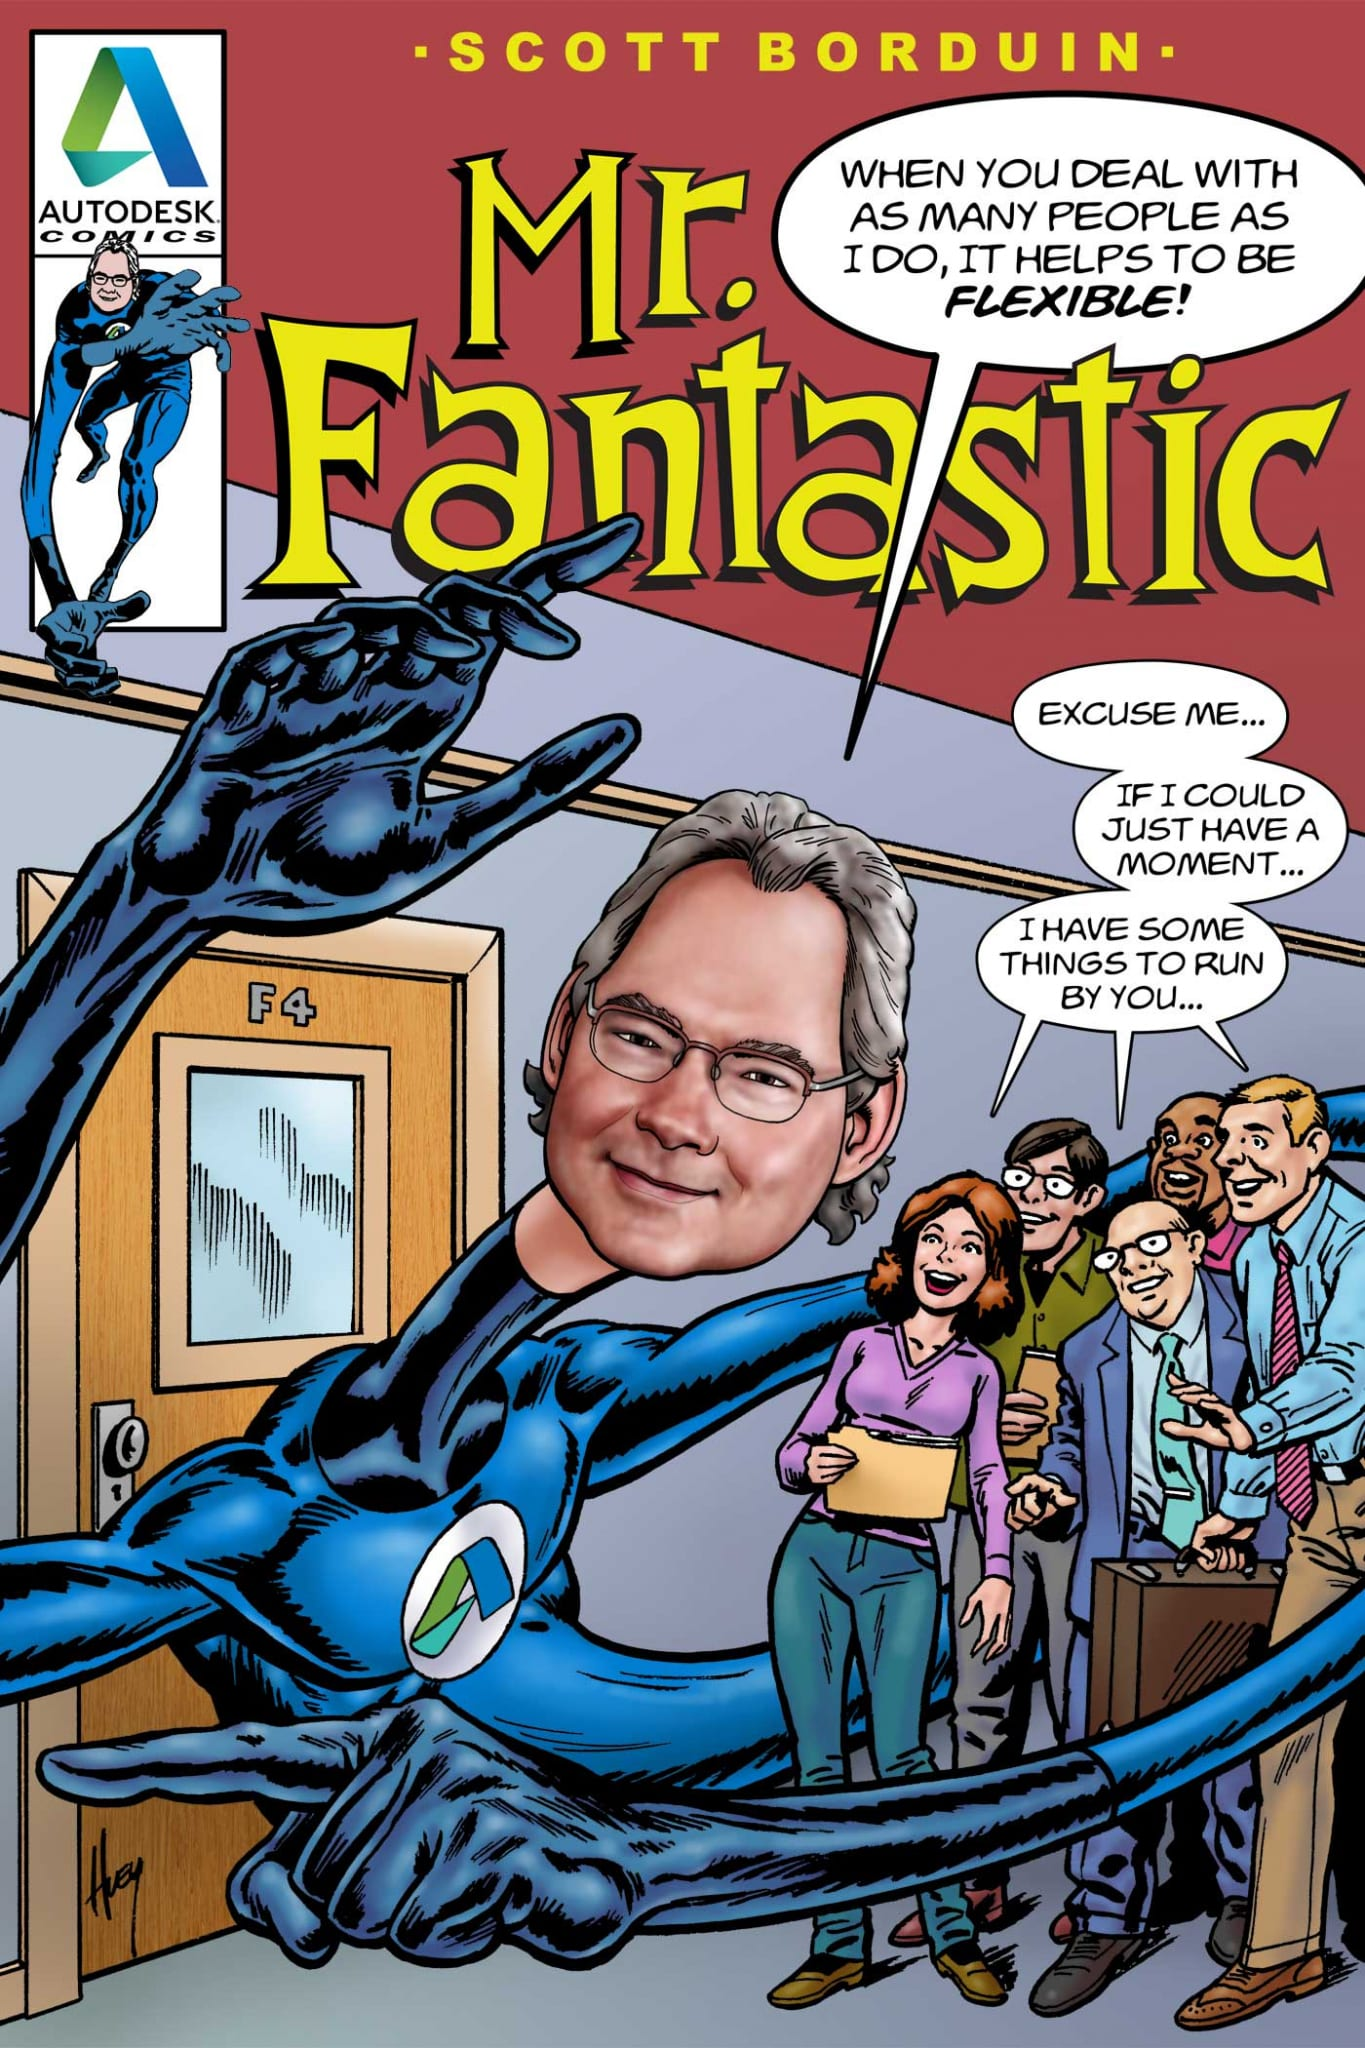 KH3432MF-mr-fantastic-office-superhero-comic